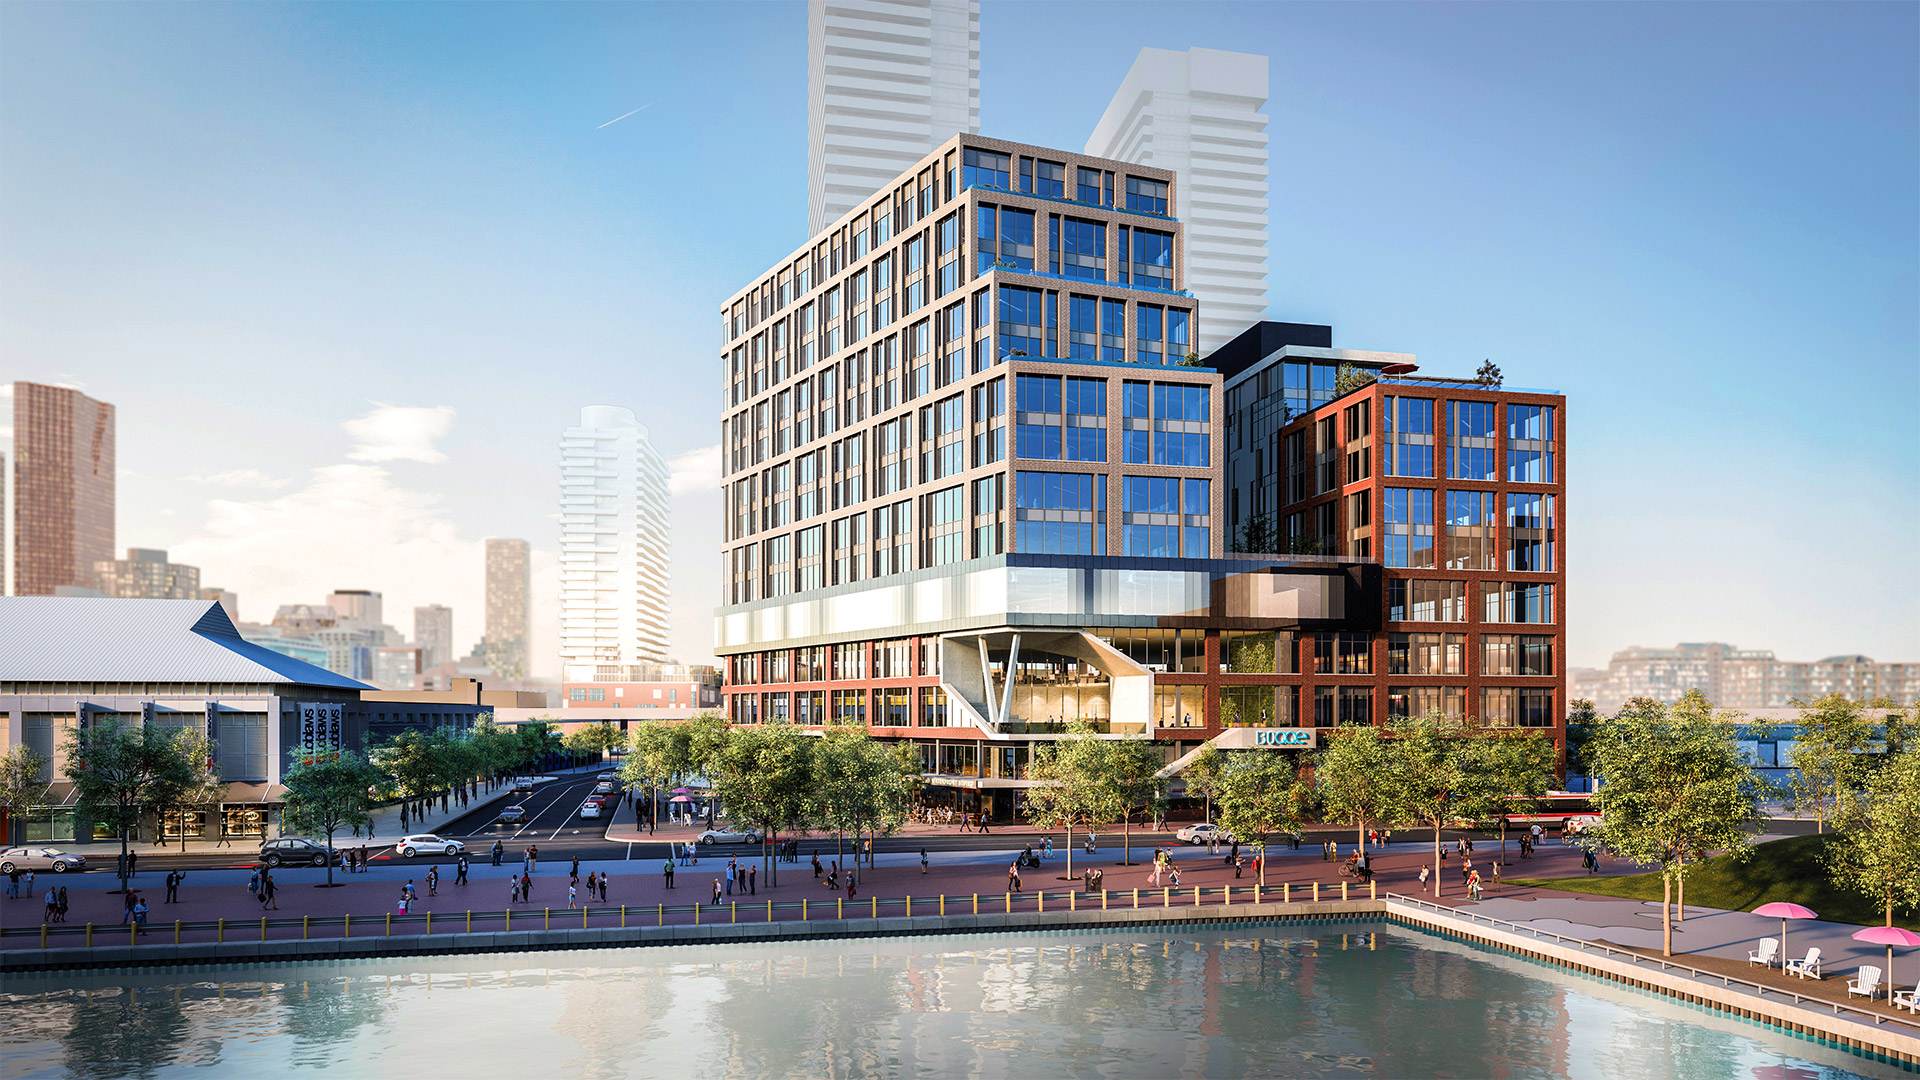 Daniels Waterfront | Official Website